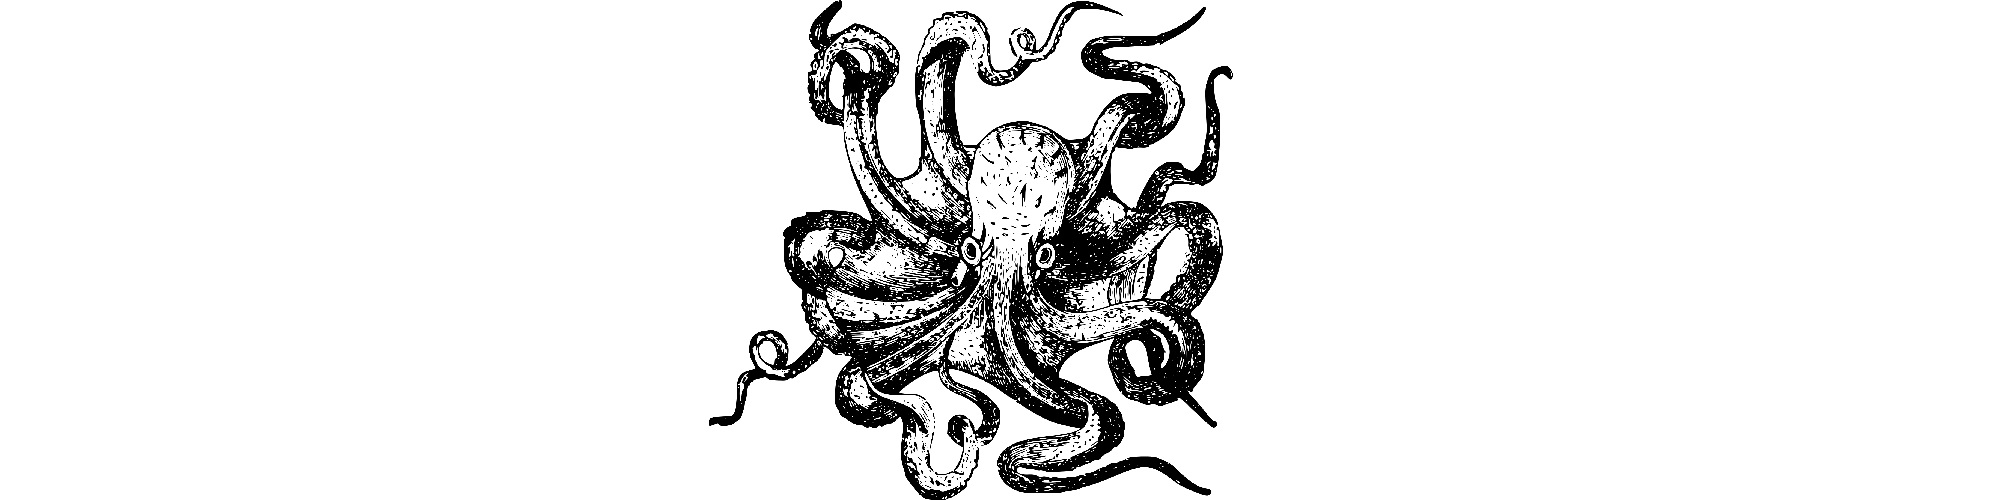 "Octopus illustration - ""Stress Relief"" short story"